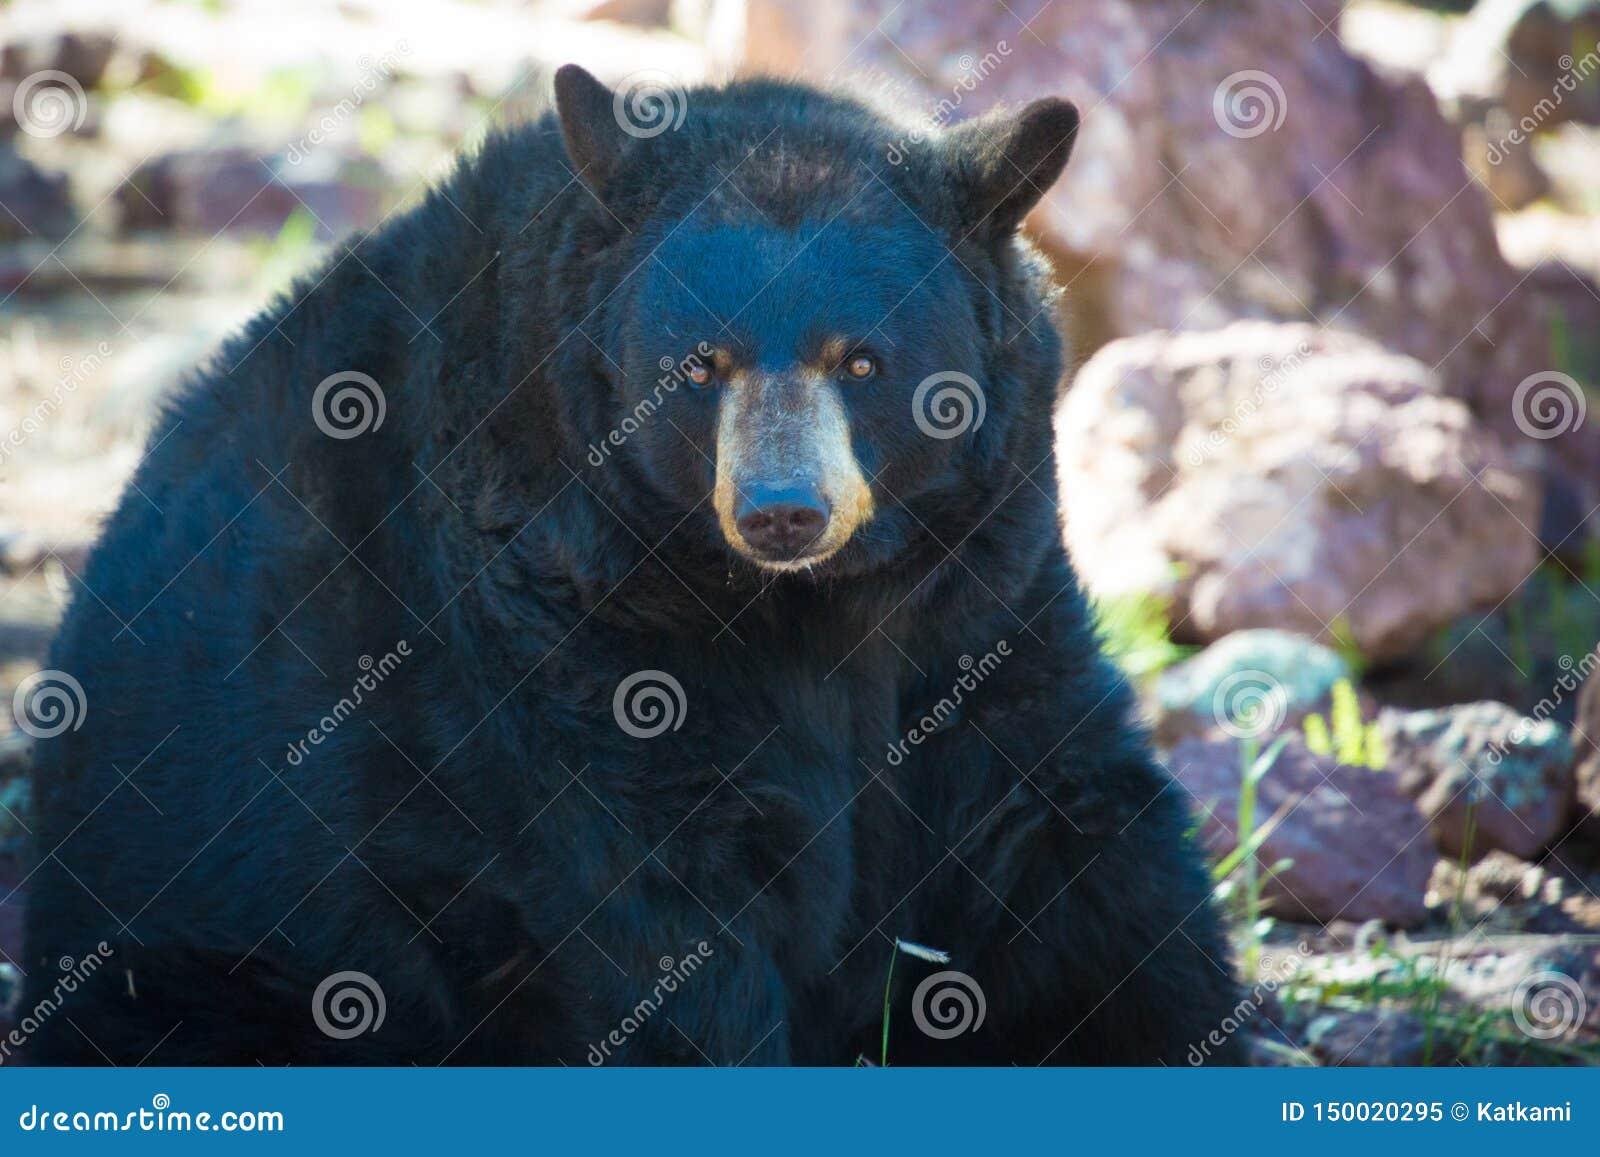 Black Bear Sitting in a Zoo